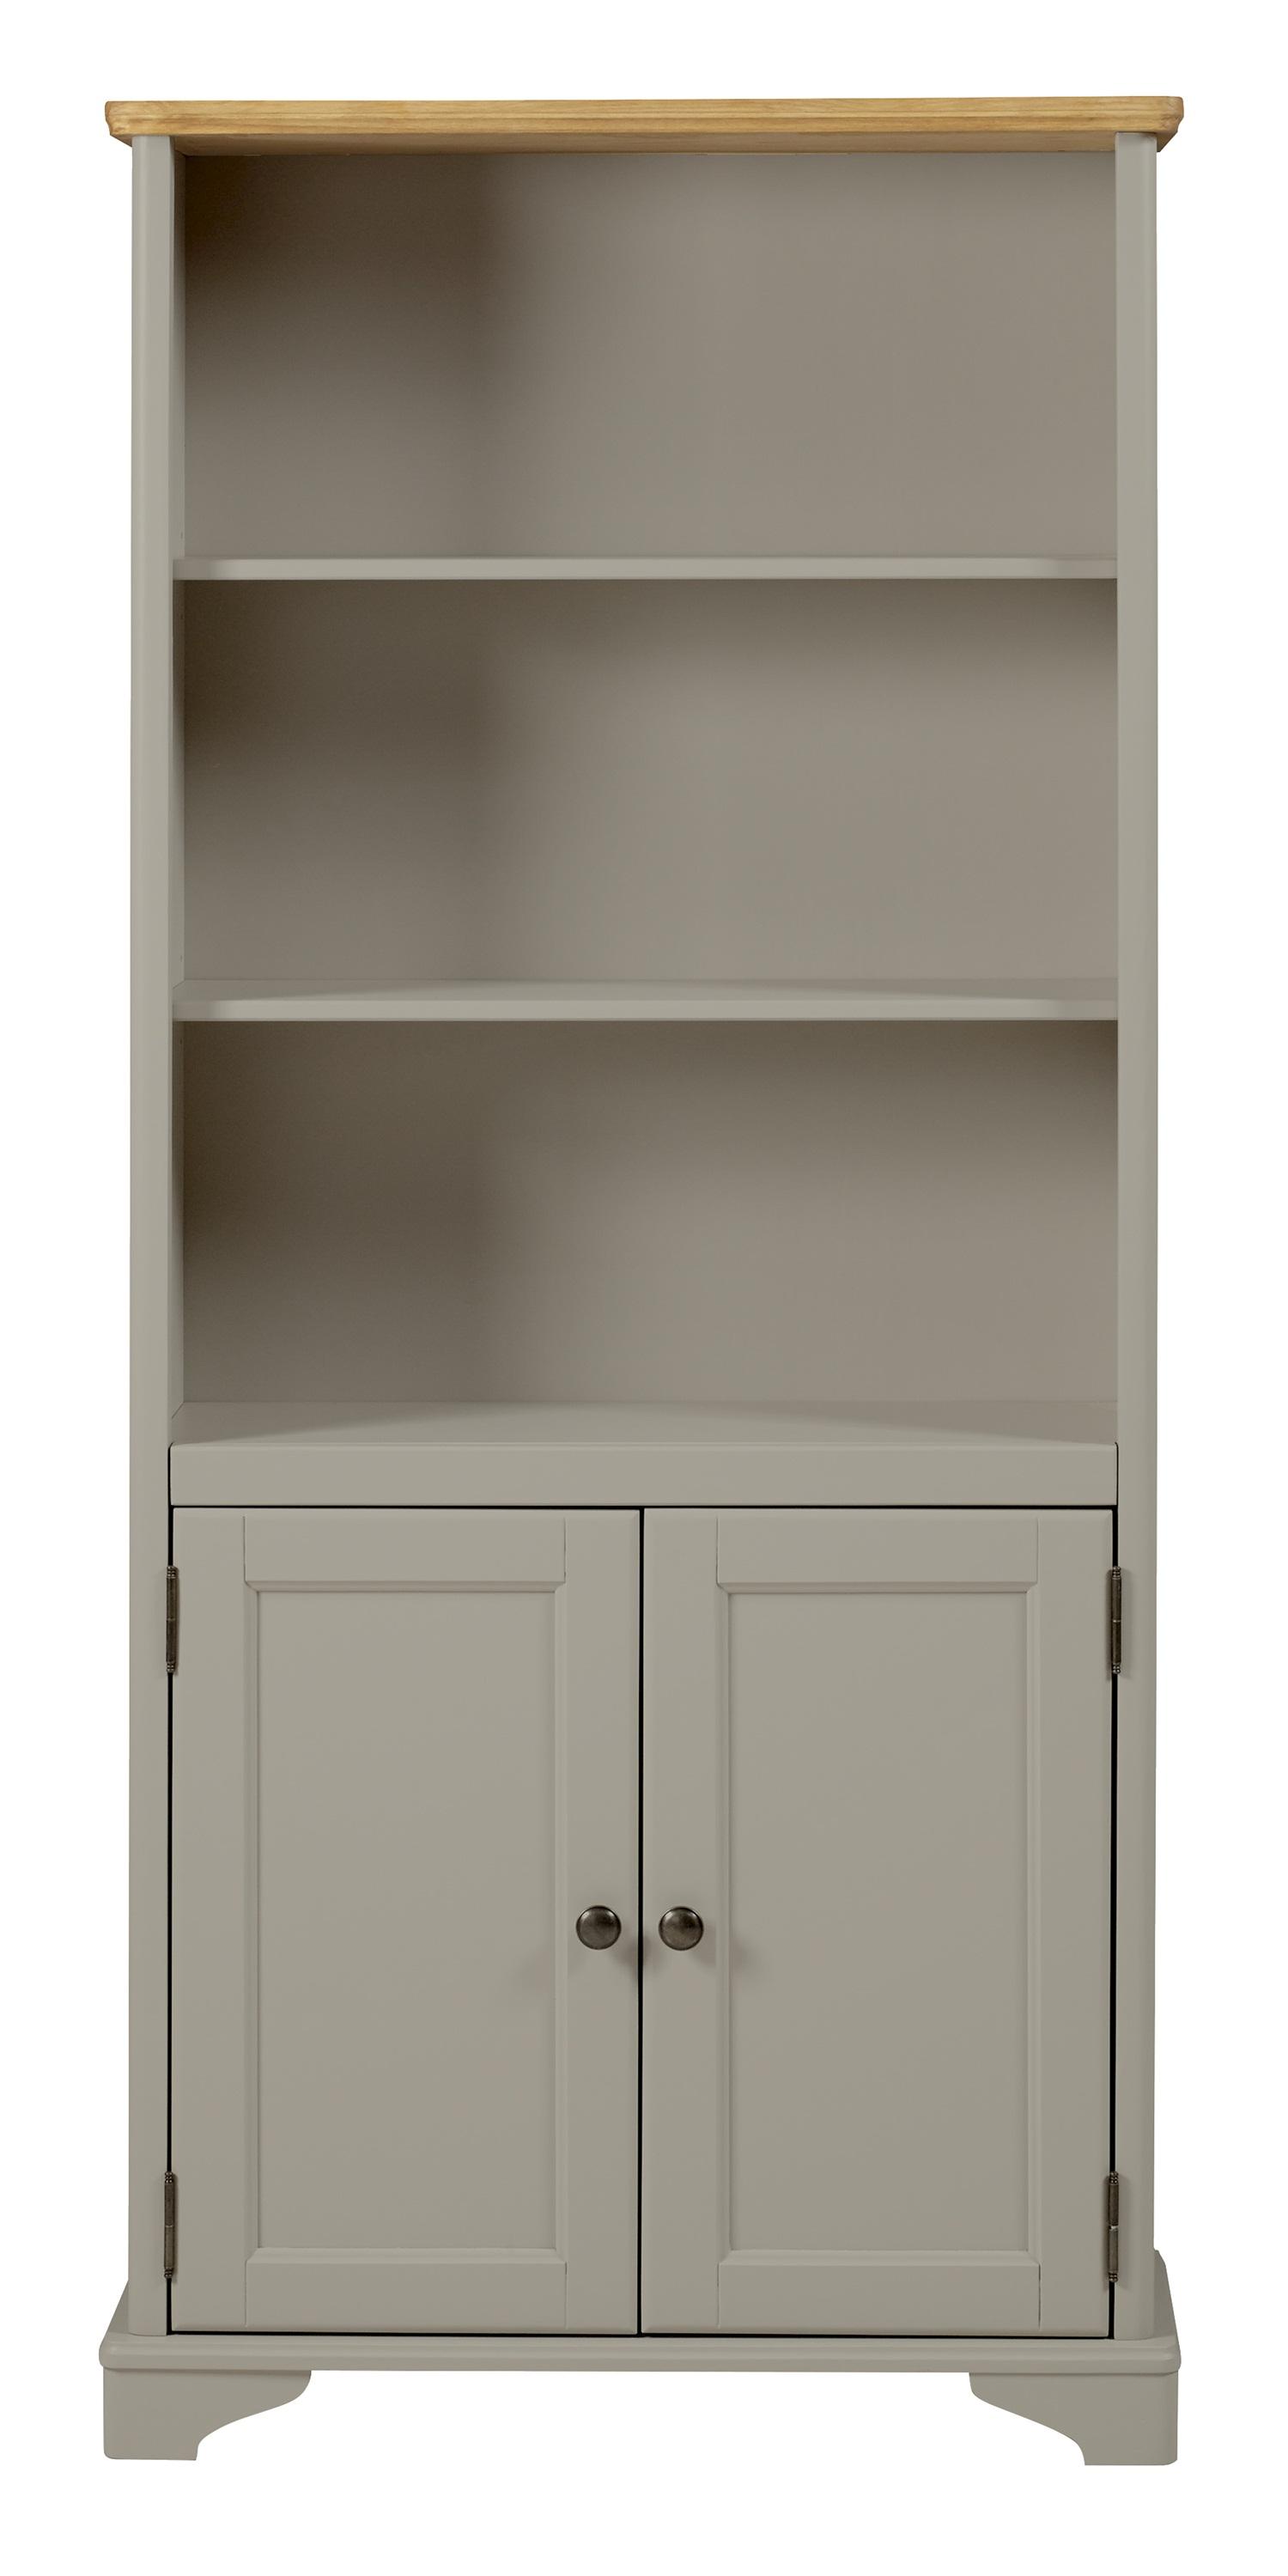 2 door tall bookcase